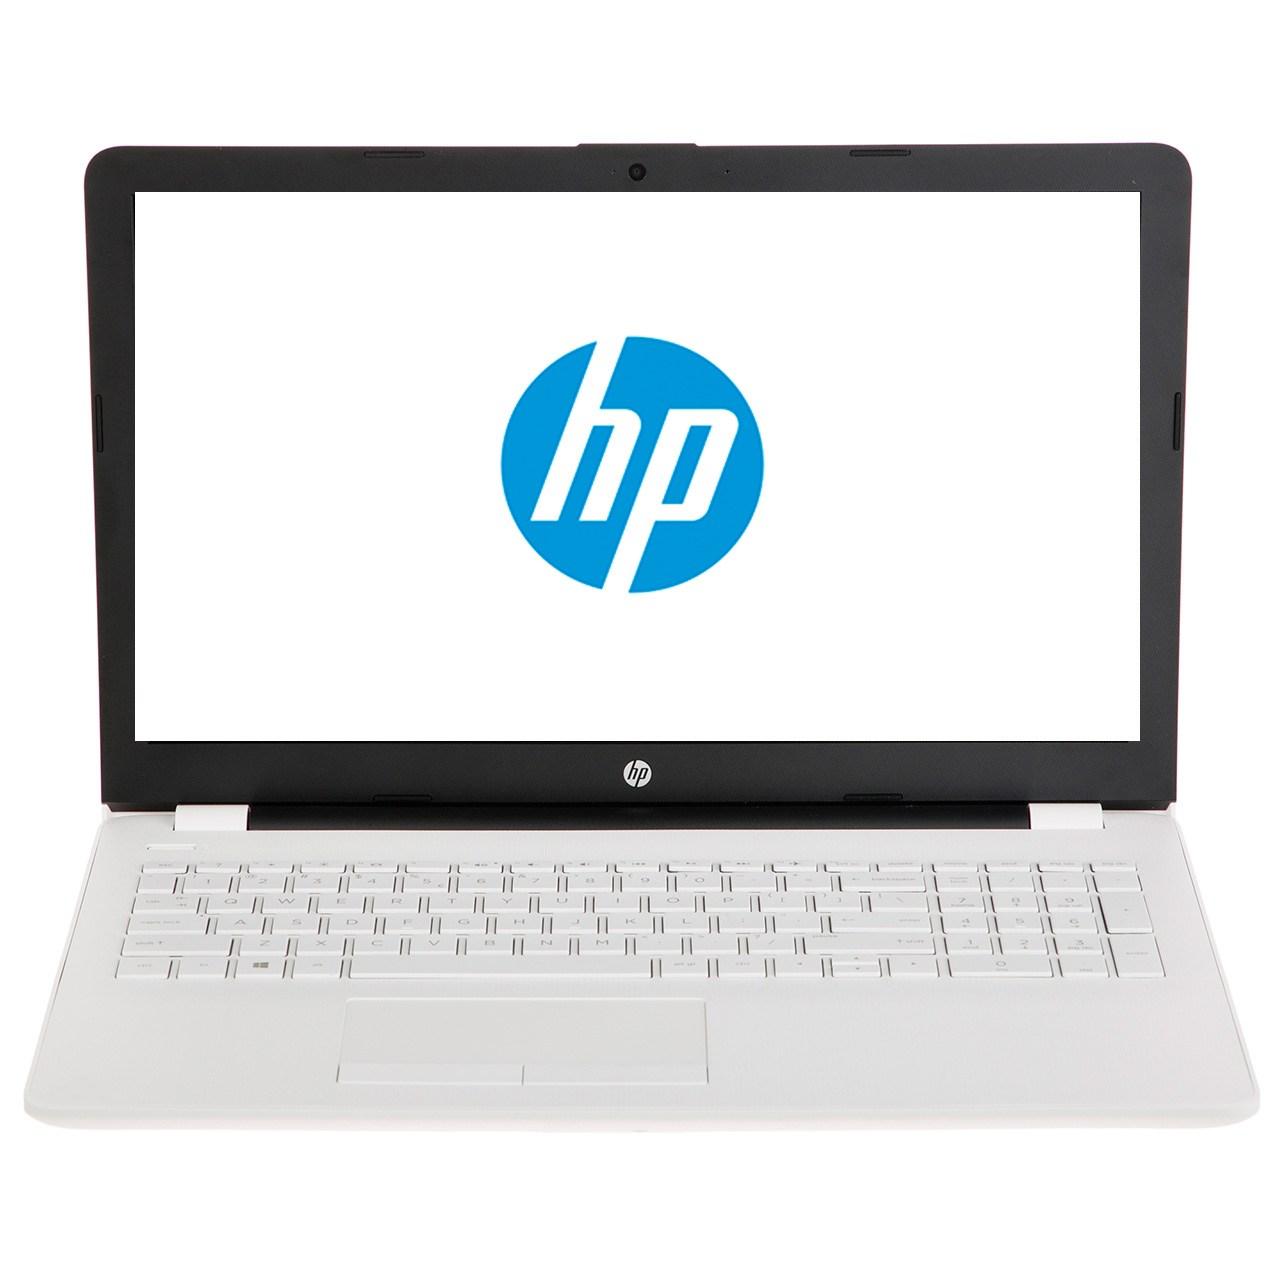 لپ تاپ 15 اینچی اچ پی مدل 15-bw097nia